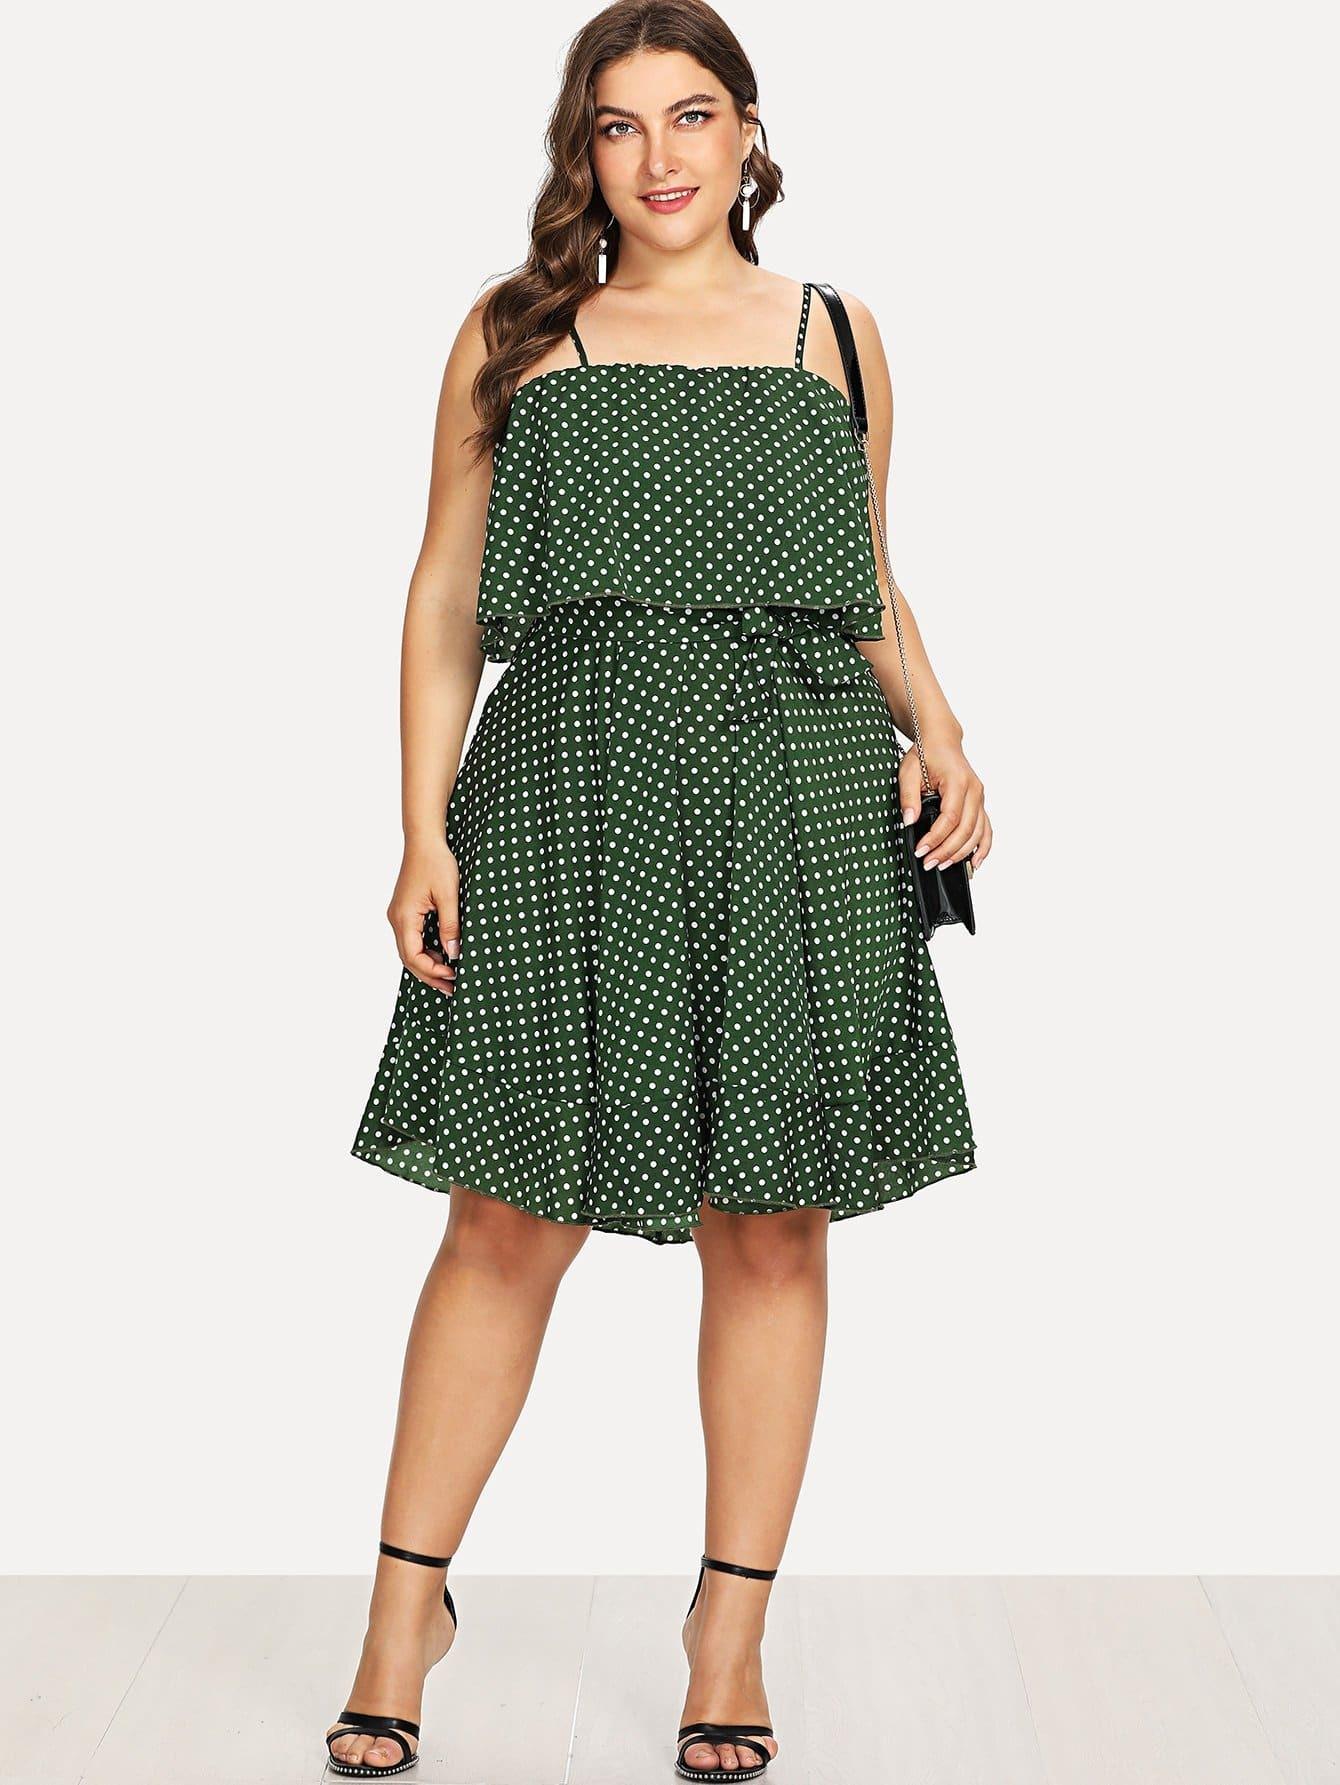 Double Layer Polka Dot Cami Dress